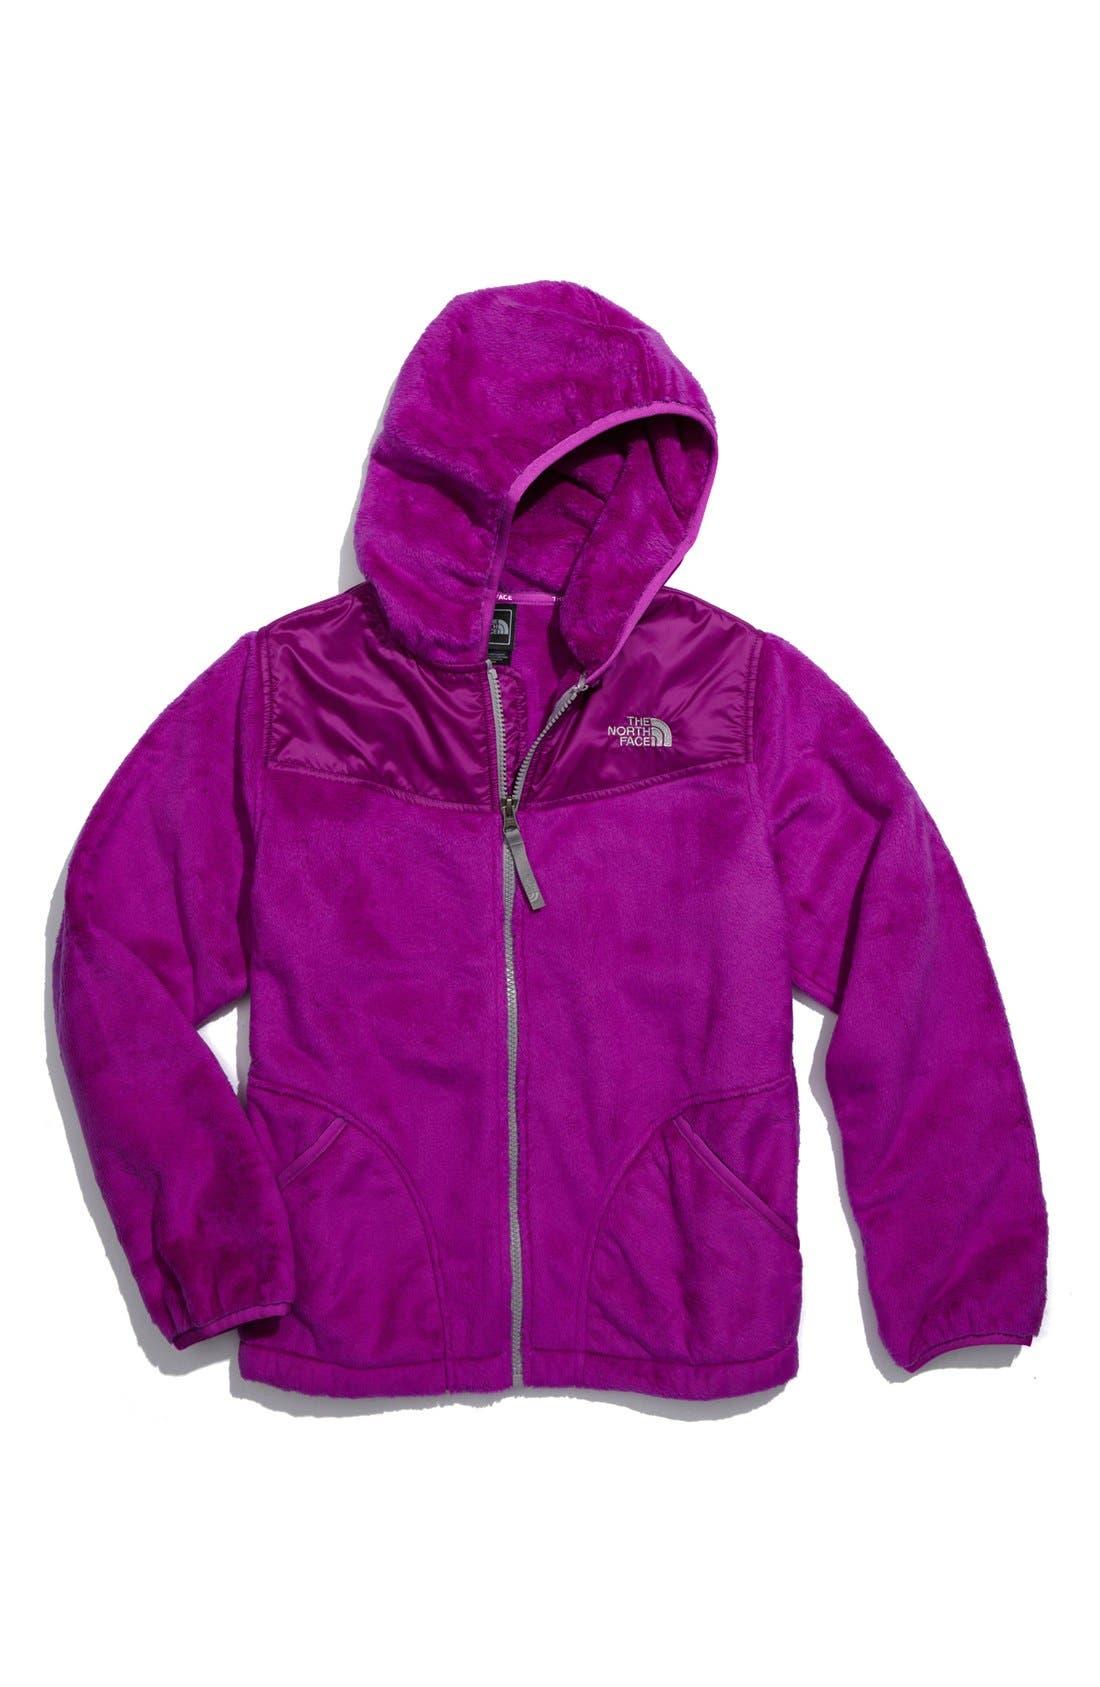 Main Image - The North Face 'Oso' Plush Fleece Hooded Jacket (Big Girls)